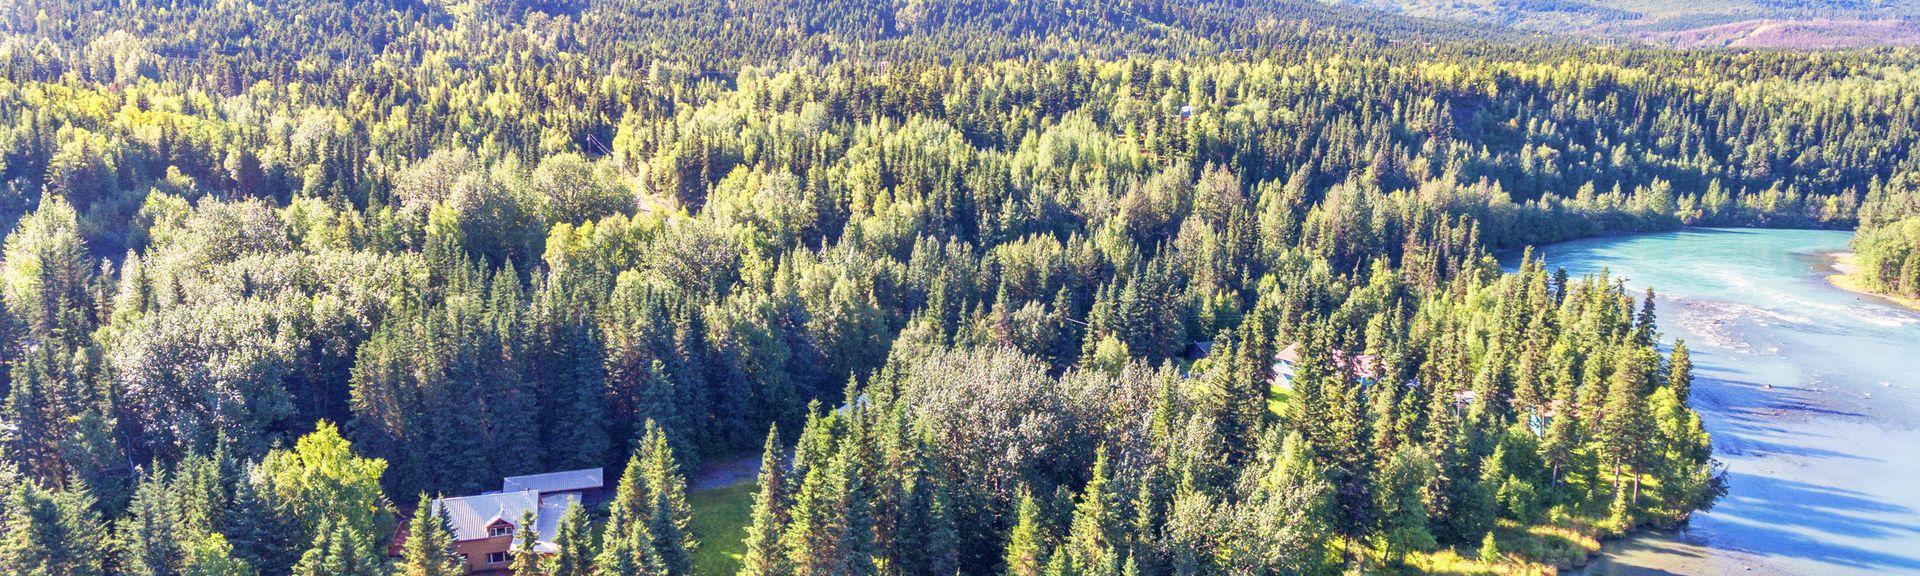 Kasilof, Alaska, United States of America